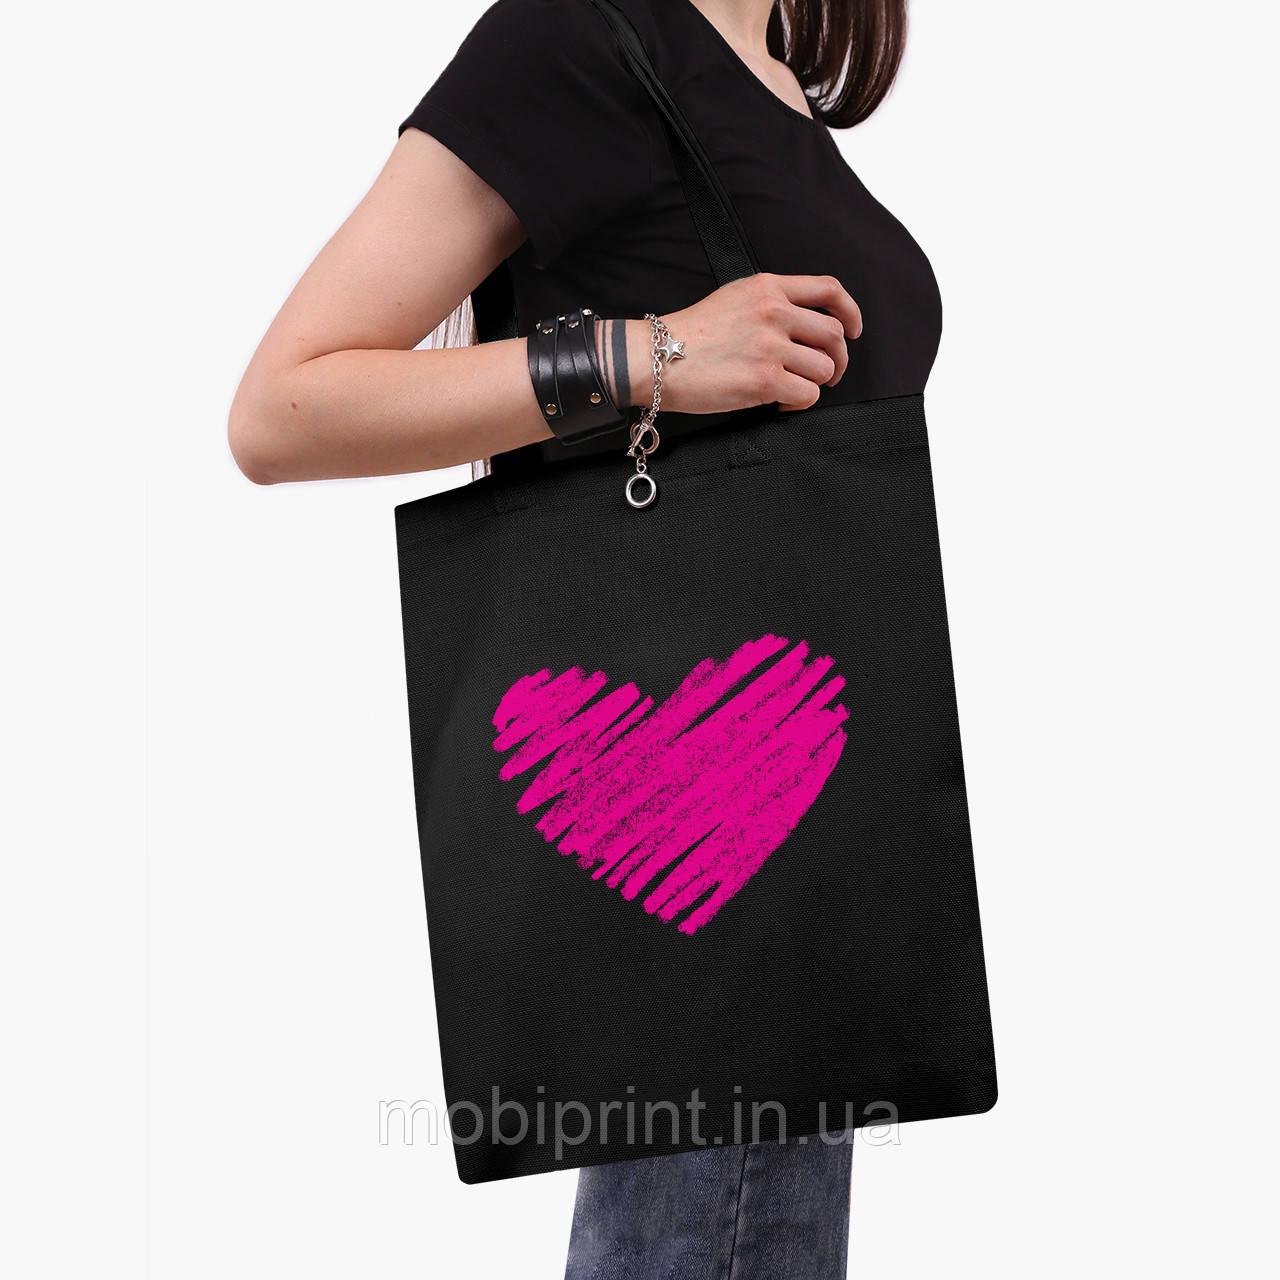 Эко сумка шоппер черная Сердце (Heart) (9227-2835-2)  41*35 см